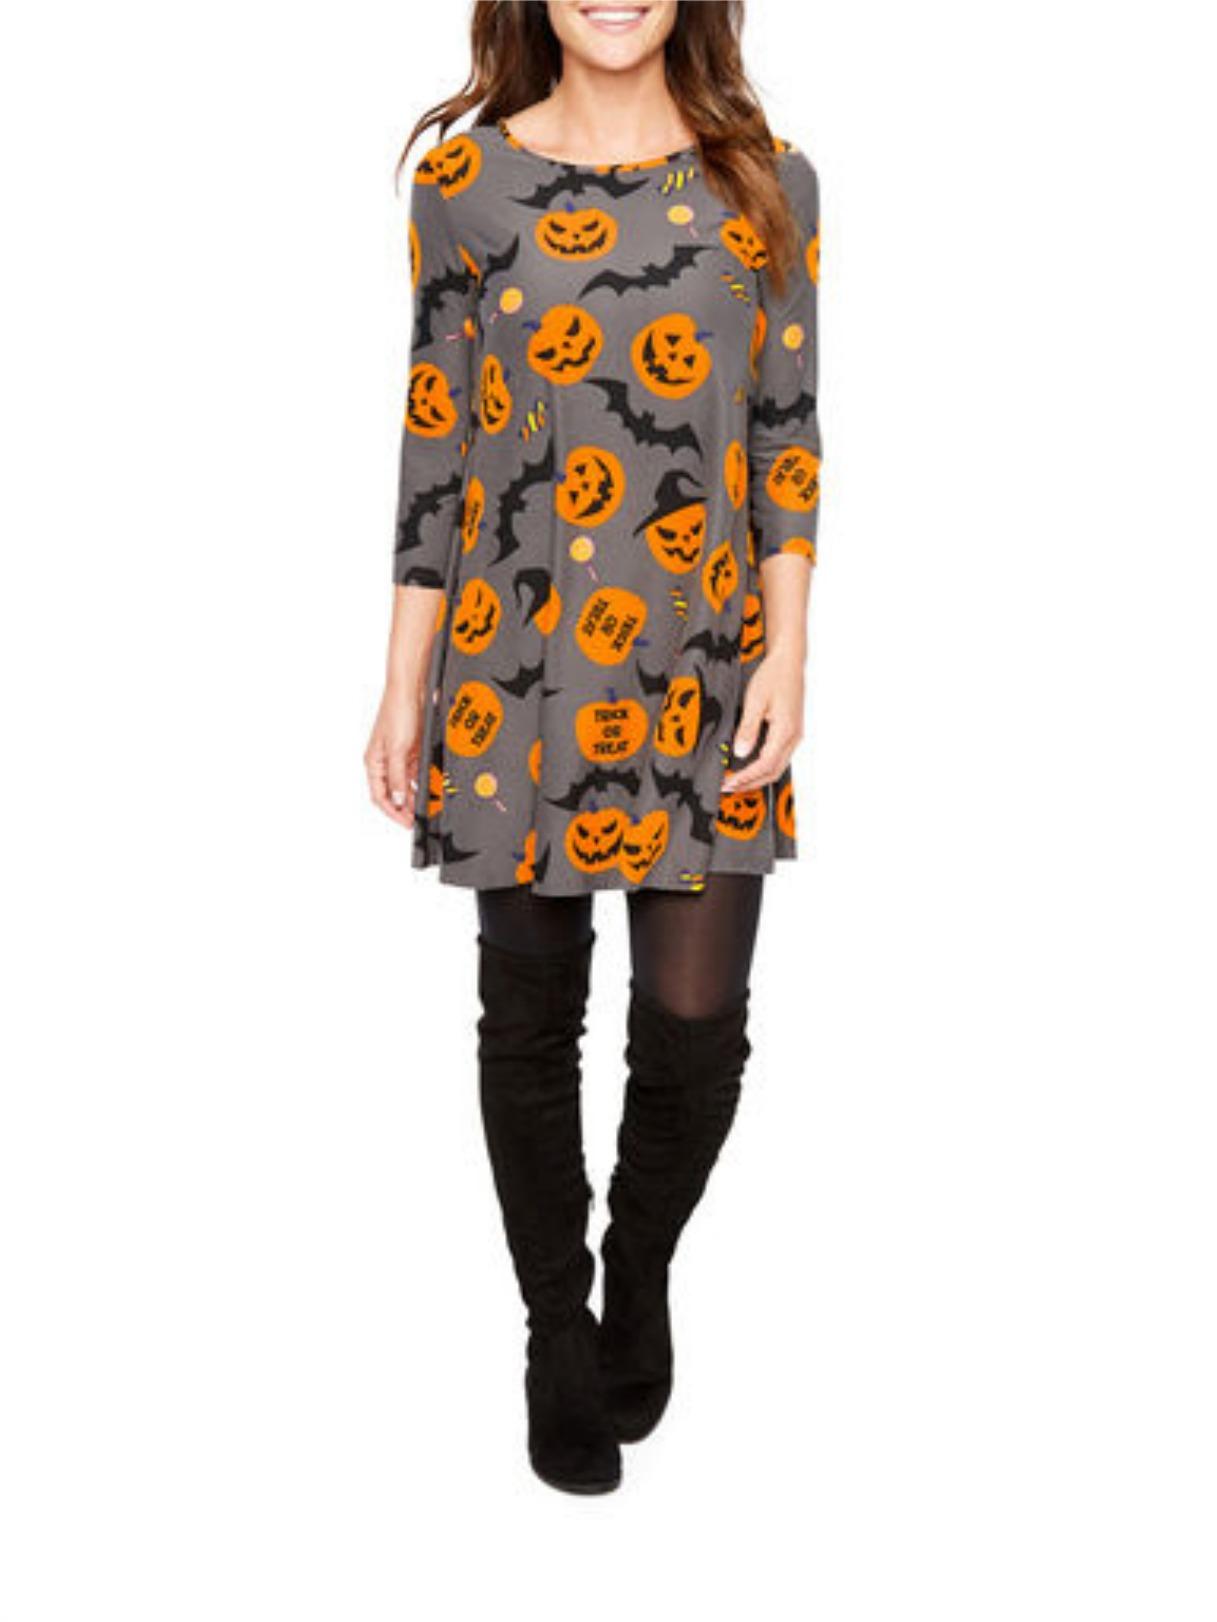 St. John's Bay 3/4 Sleeve Halloween Swing Dress - Gray Trick O Treat